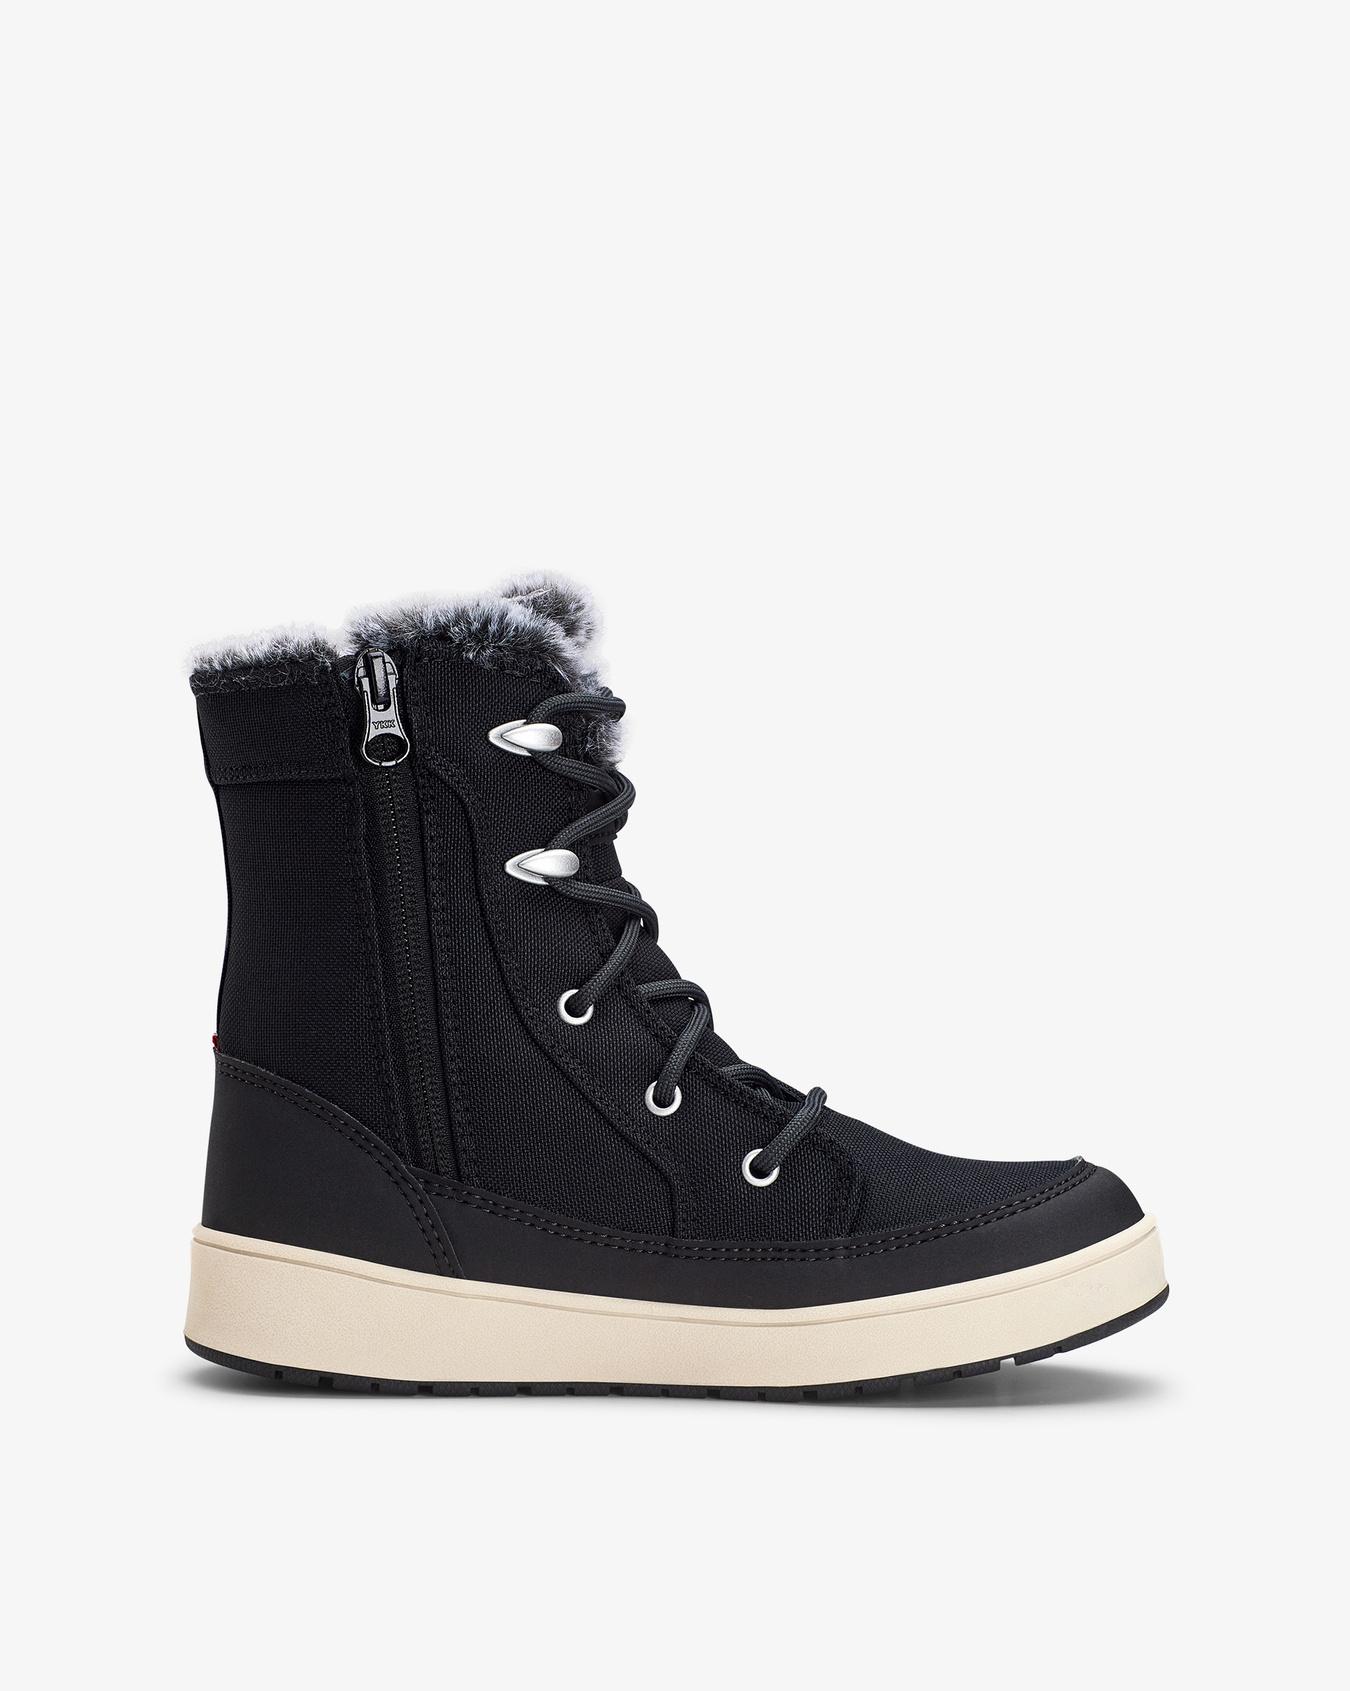 Maia Zip GTX Black Winter Boots